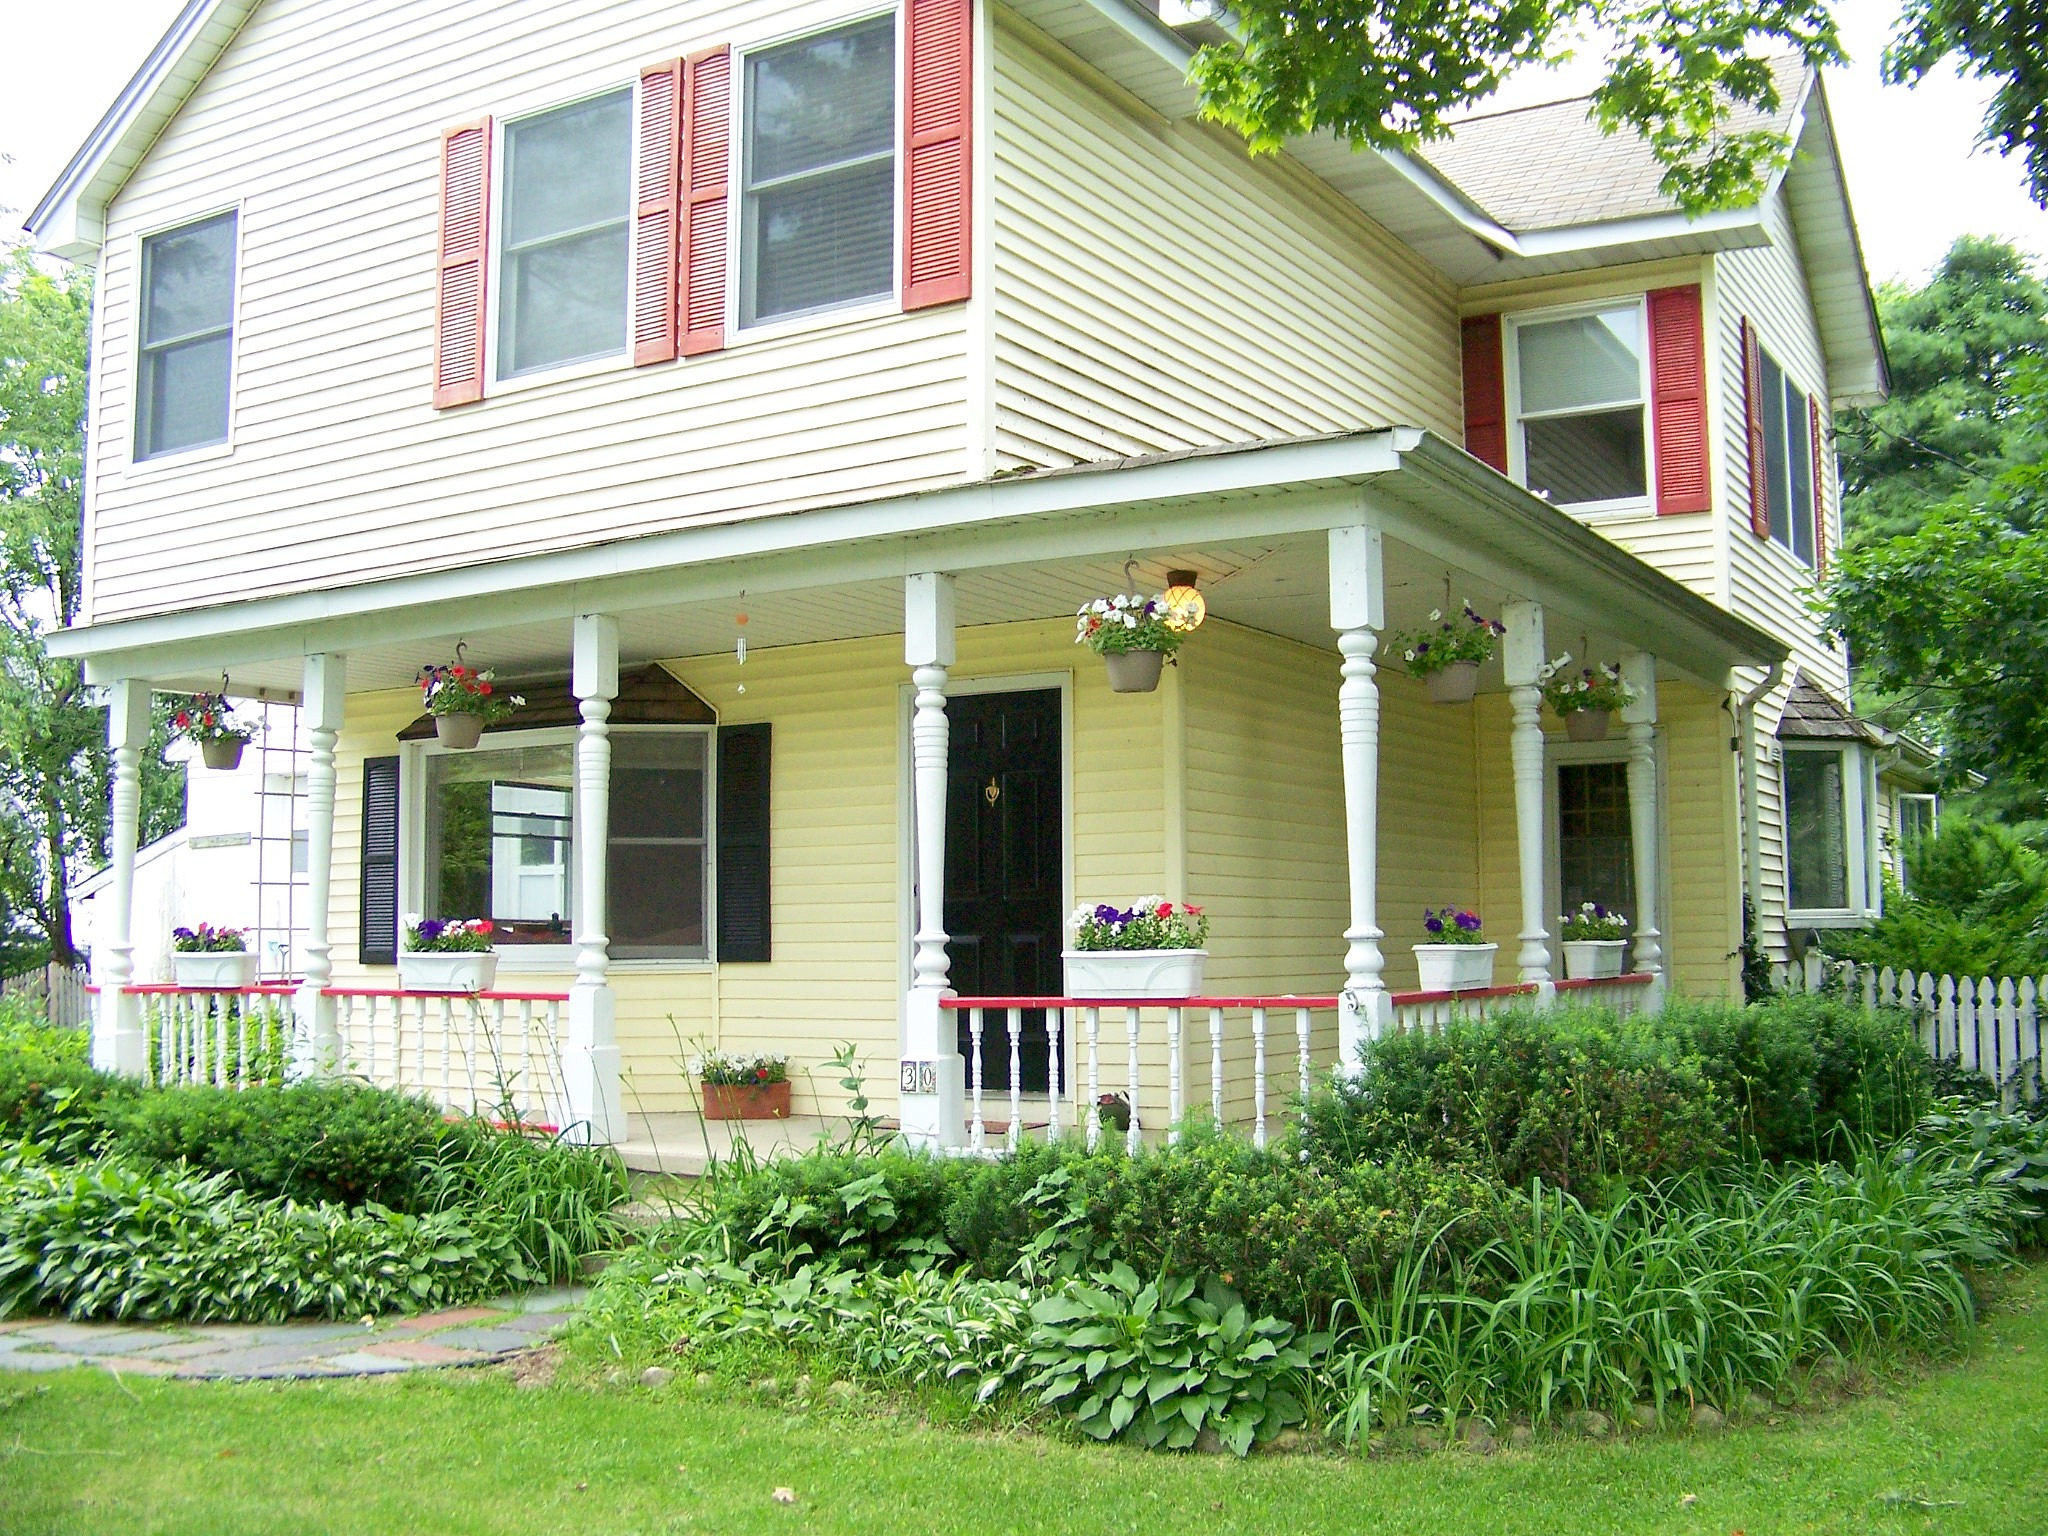 4 Bedrooms / 2.5 Bathrooms - Est. $2,267.00 / Month* for rent in Andover, NJ